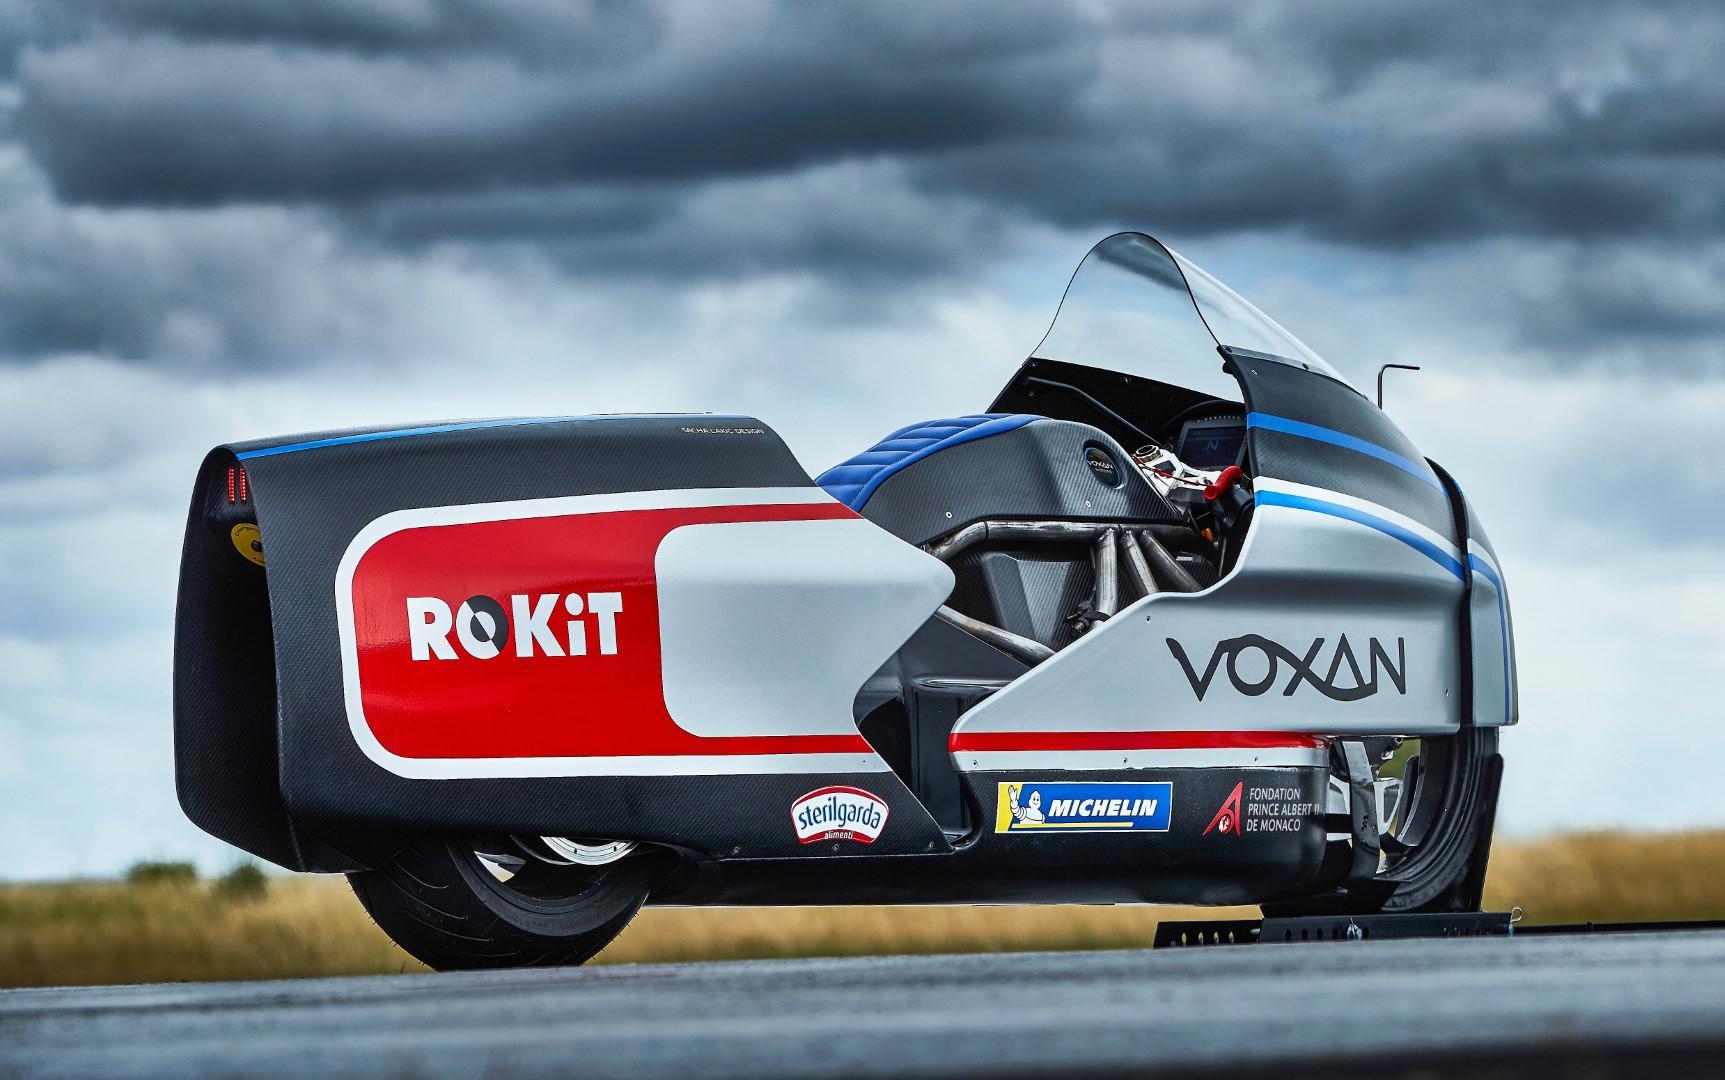 voxan-motors-devoile-la-moto-electrique-haute-performance-wattman-1317-1.jpg